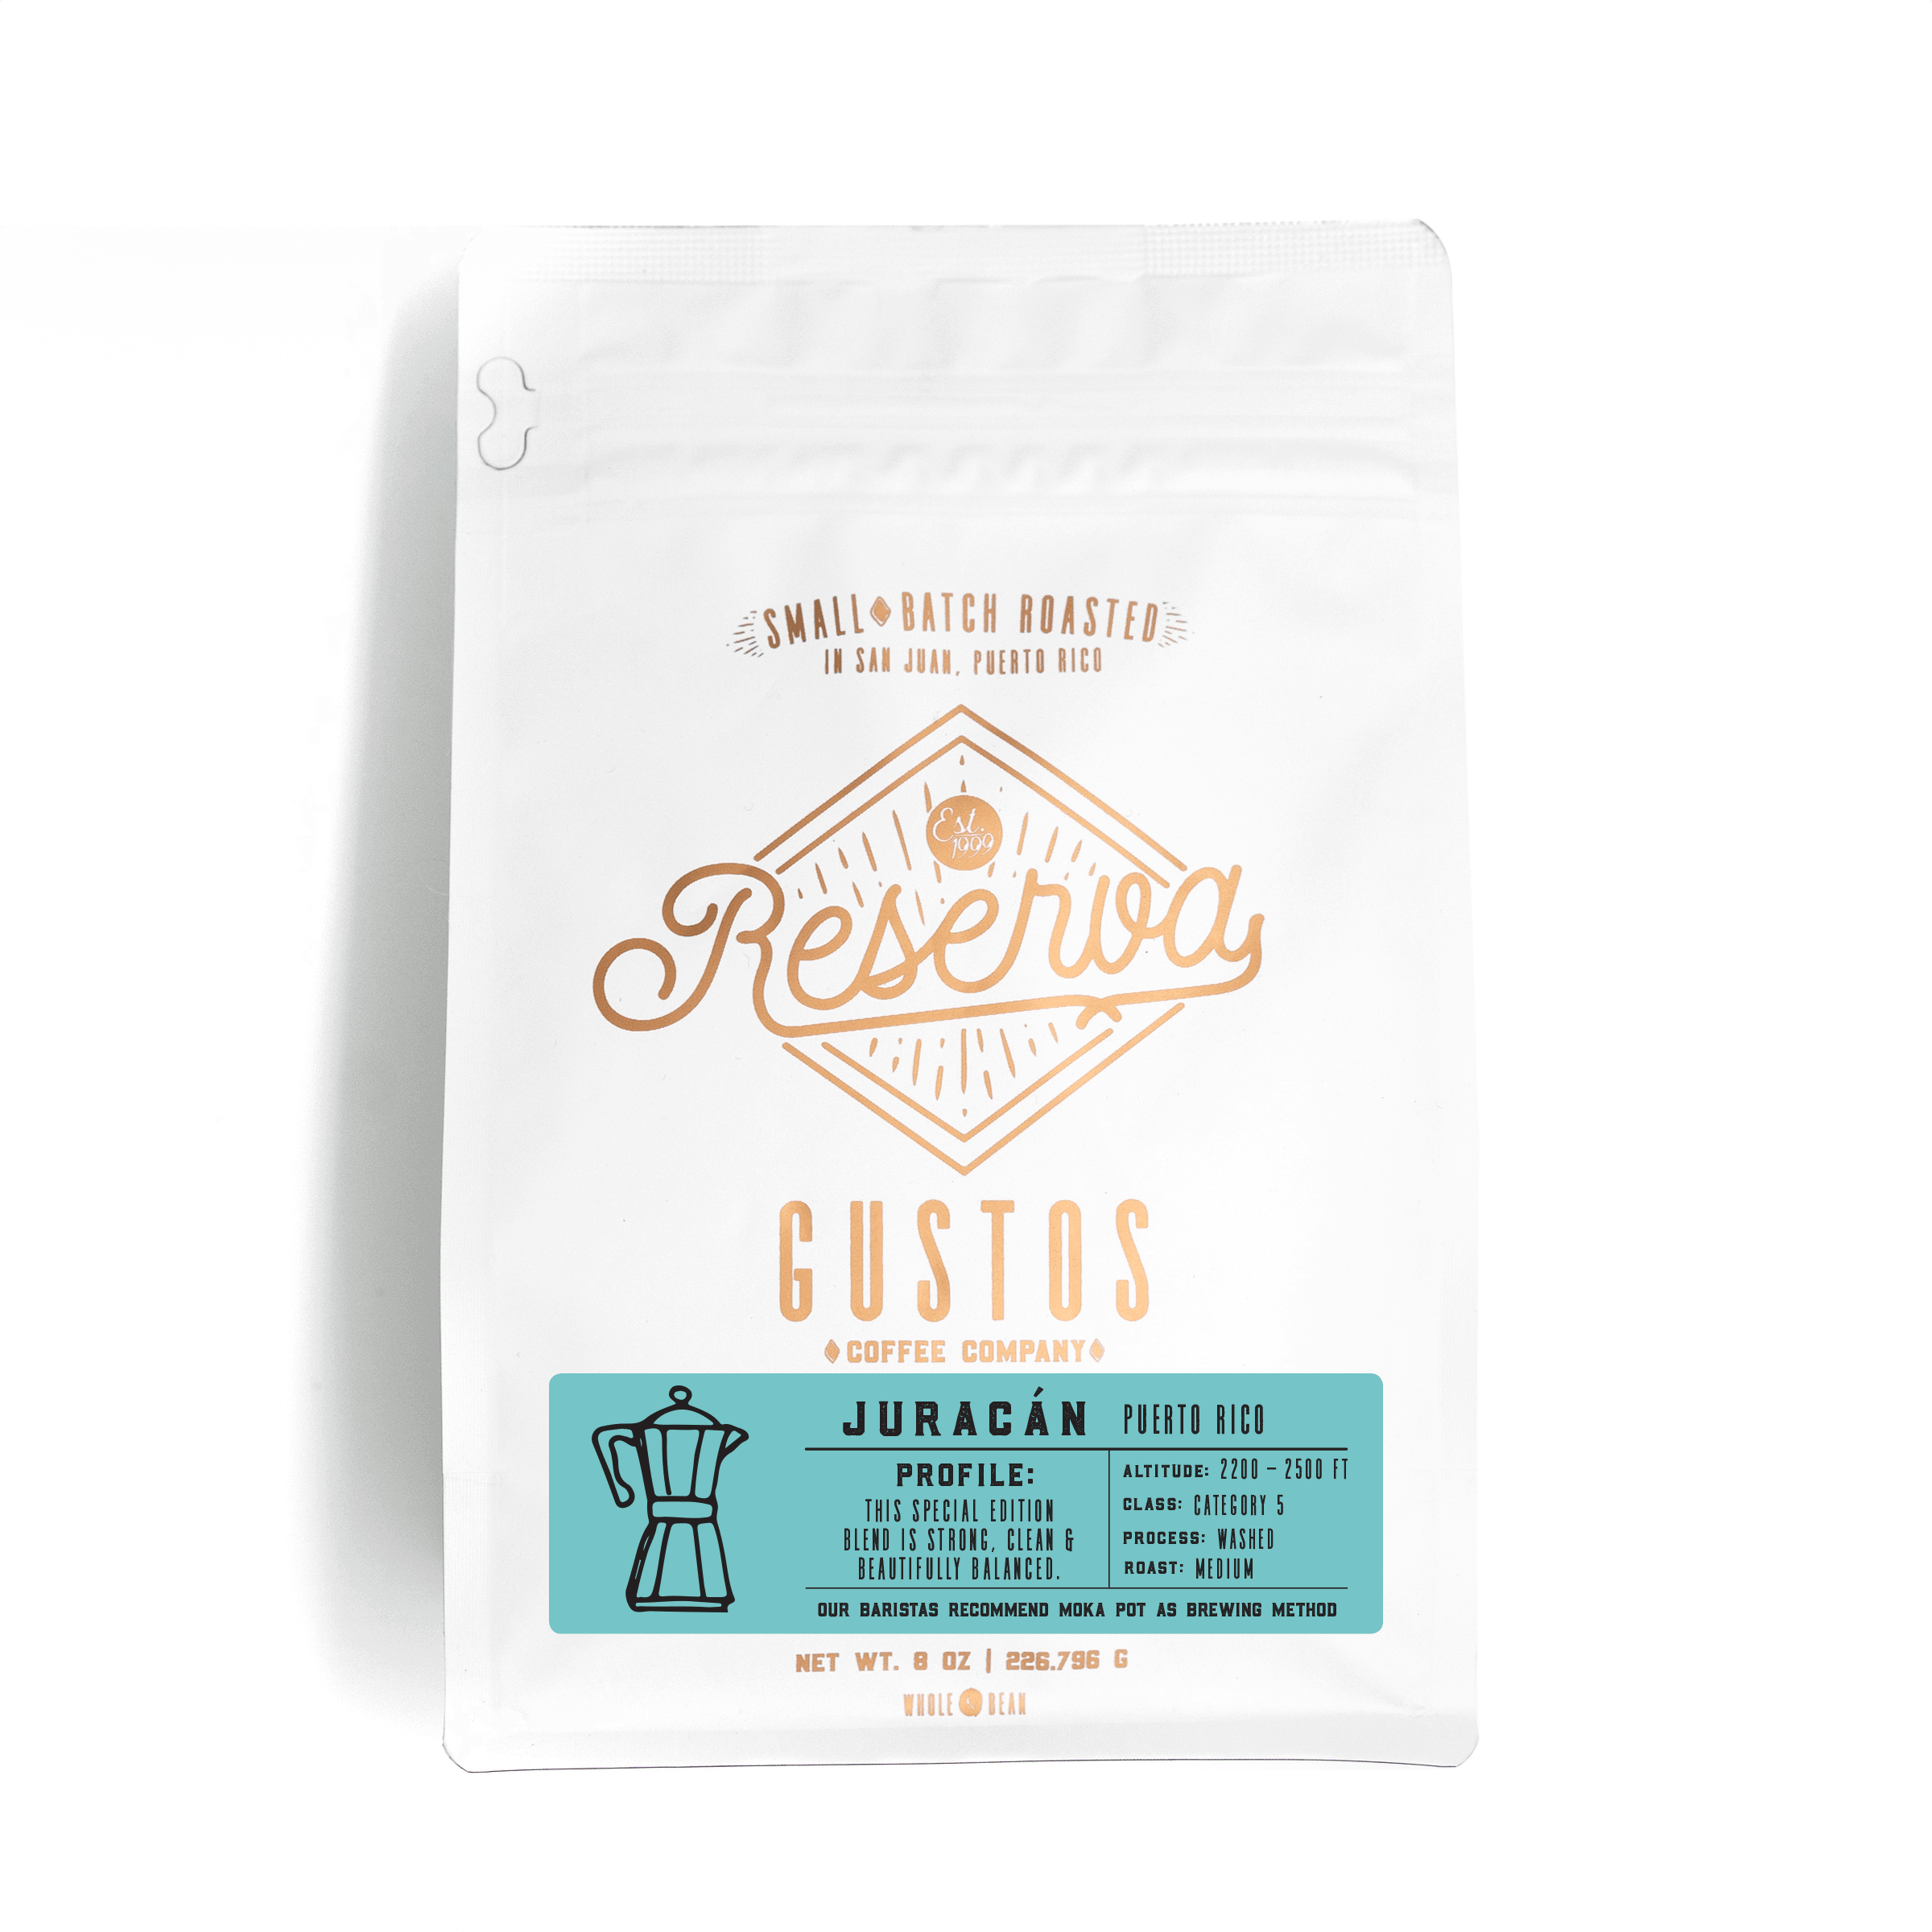 Gustos Reserva Specialty Coffee Single Origin Juracan Puerto Rico 8 oz Whole Bean Grano